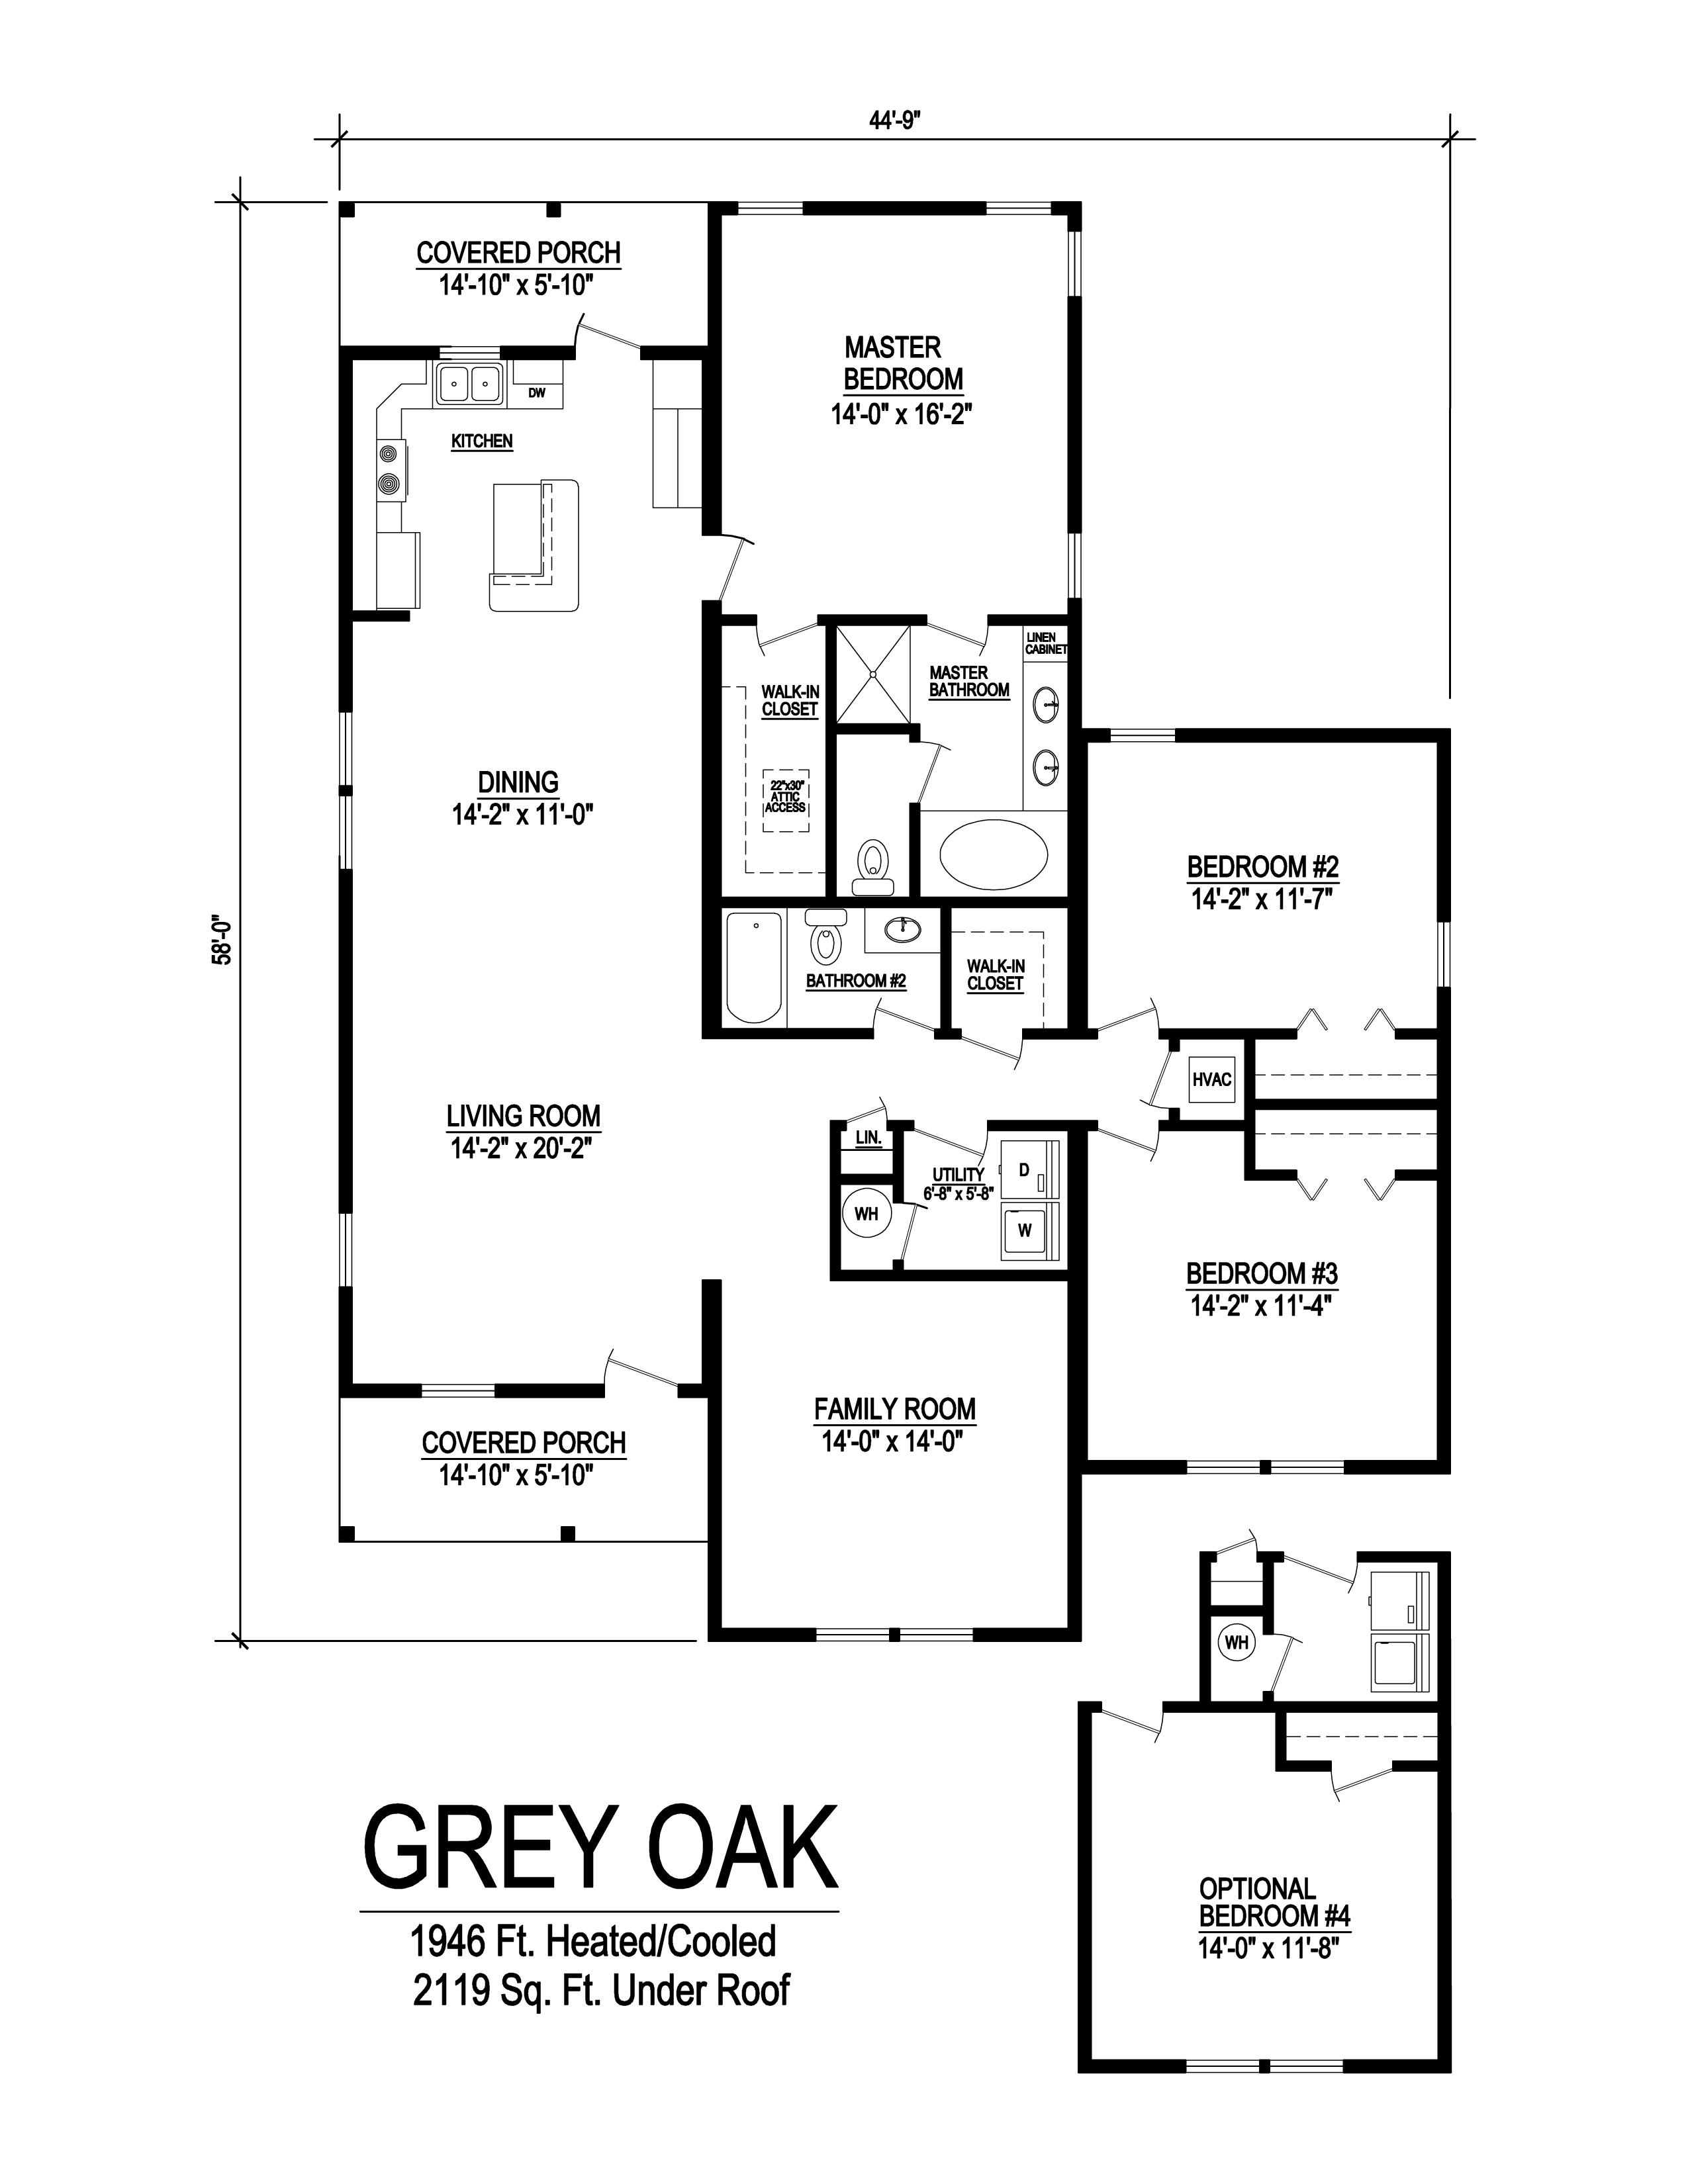 grey oak modular home floorplan